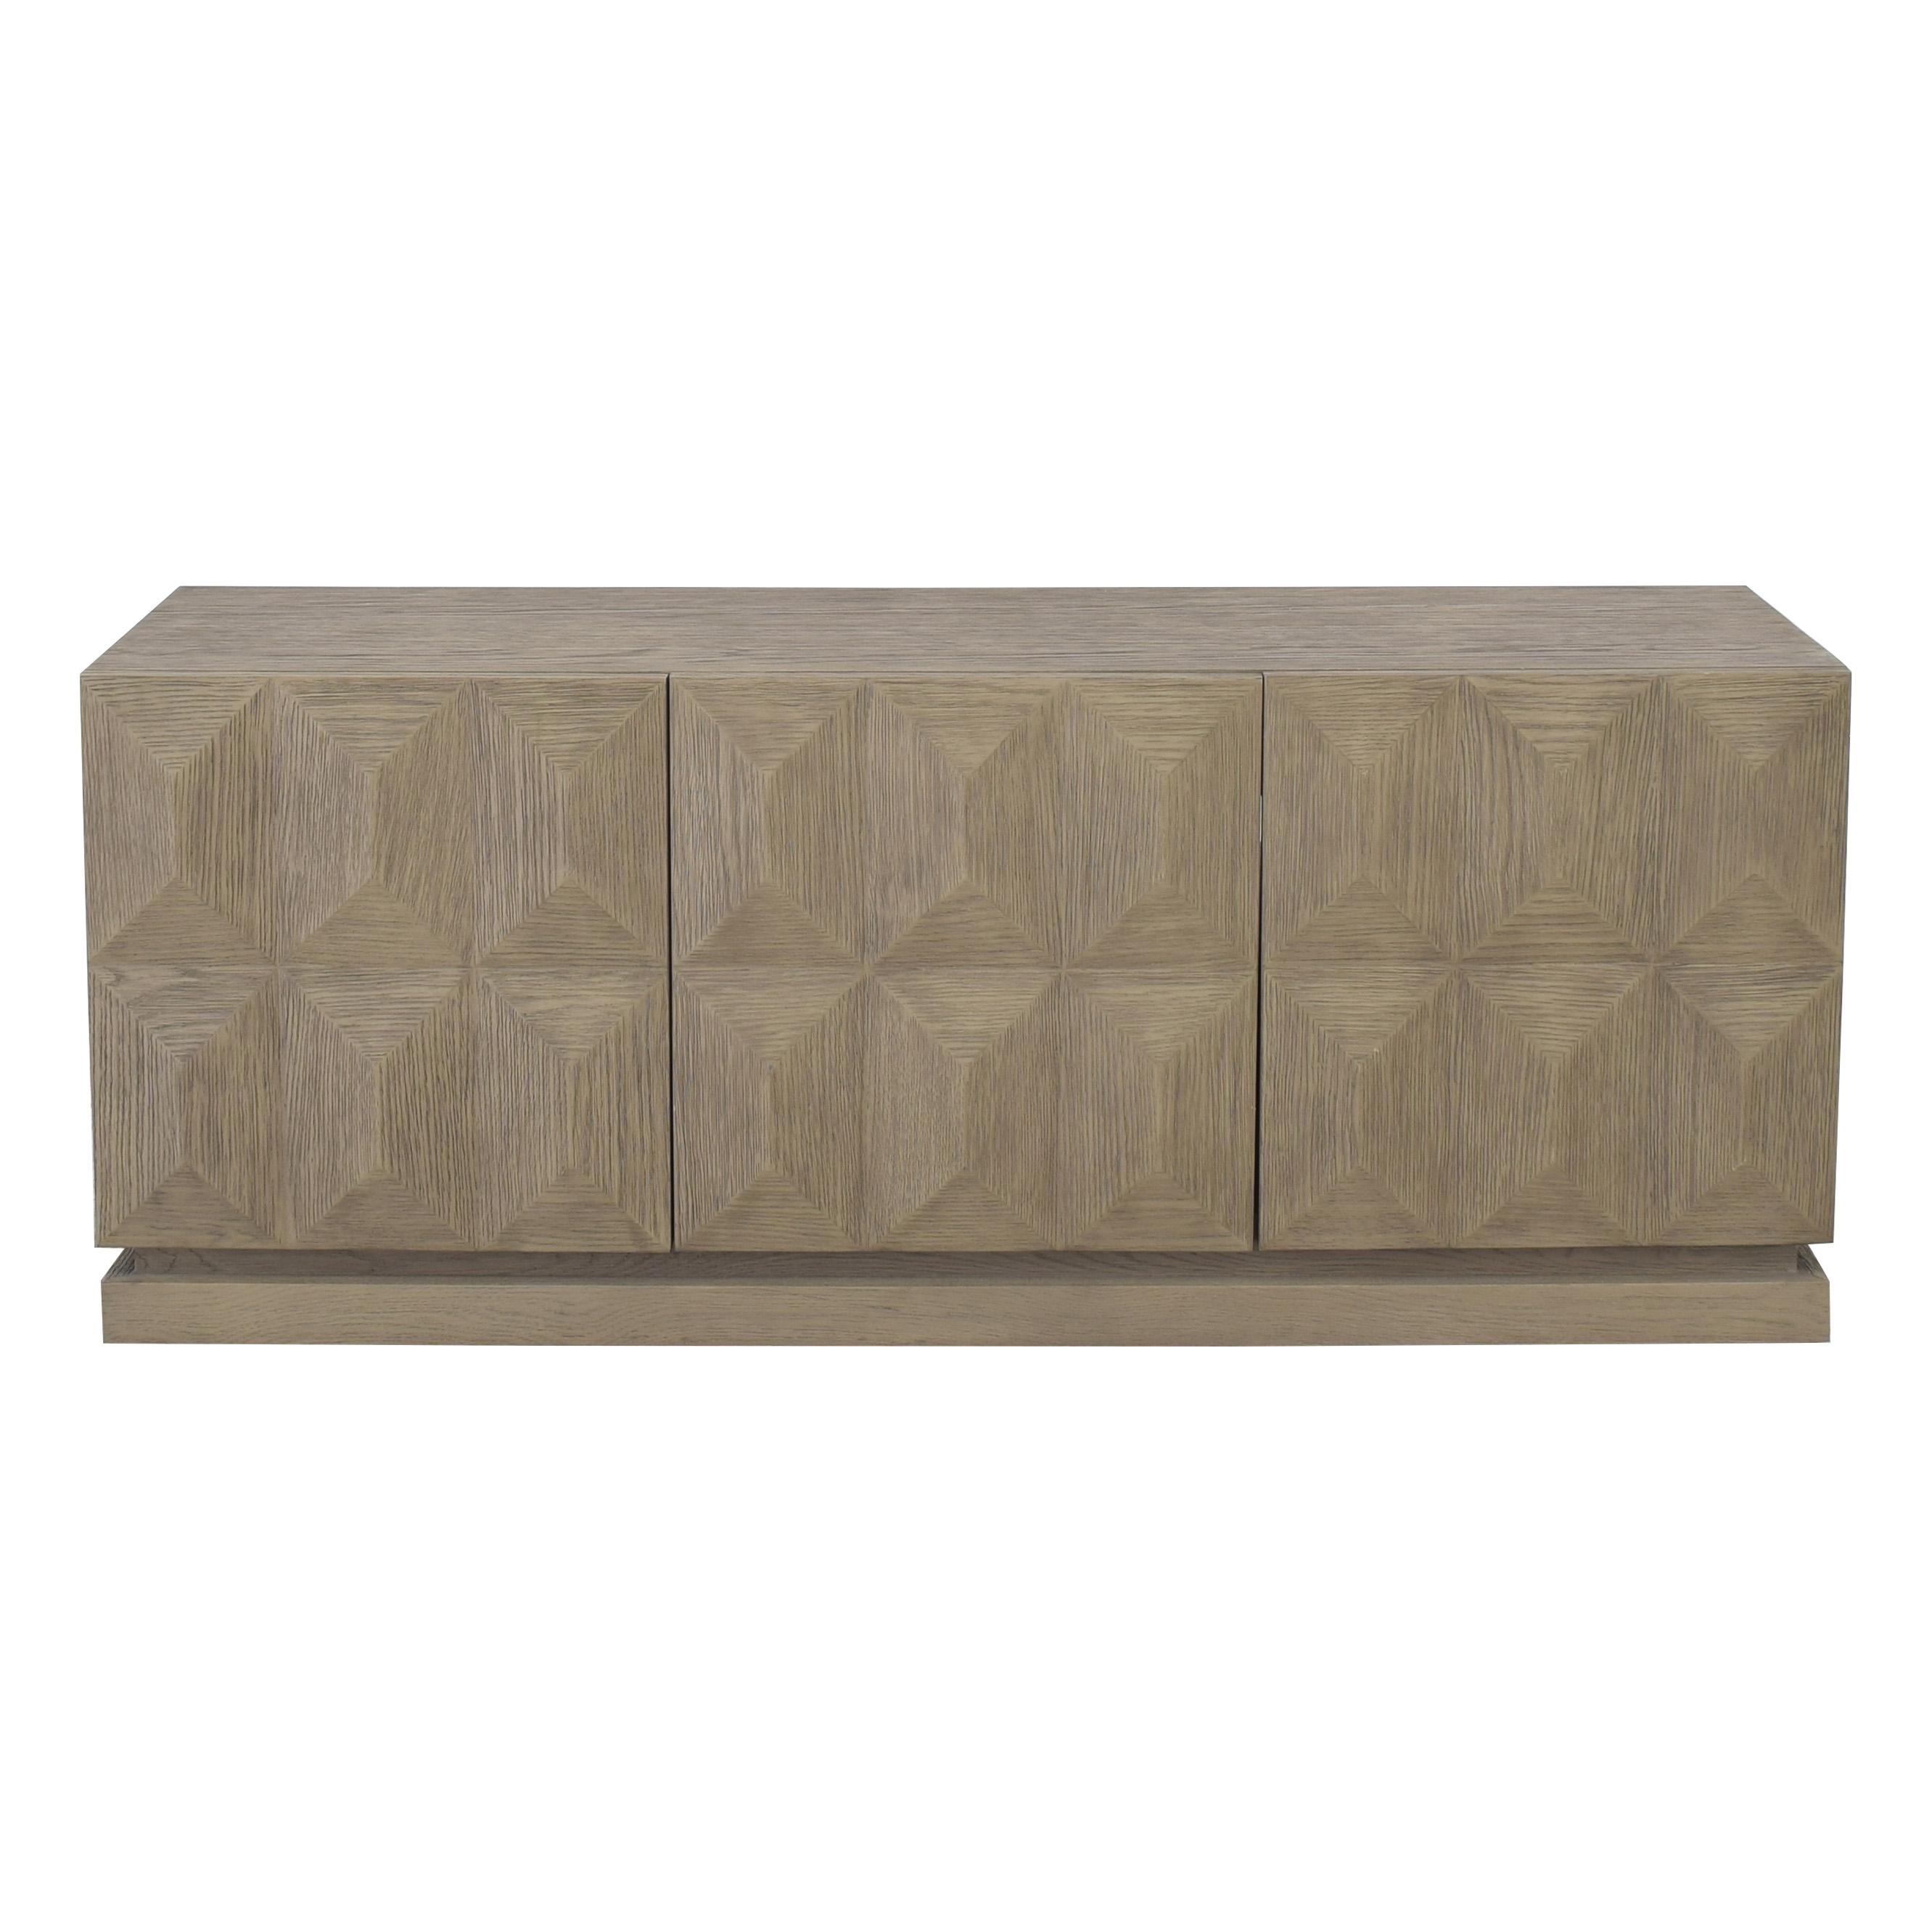 Restoration Hardware Geometric Triple Door Sideboard / Storage